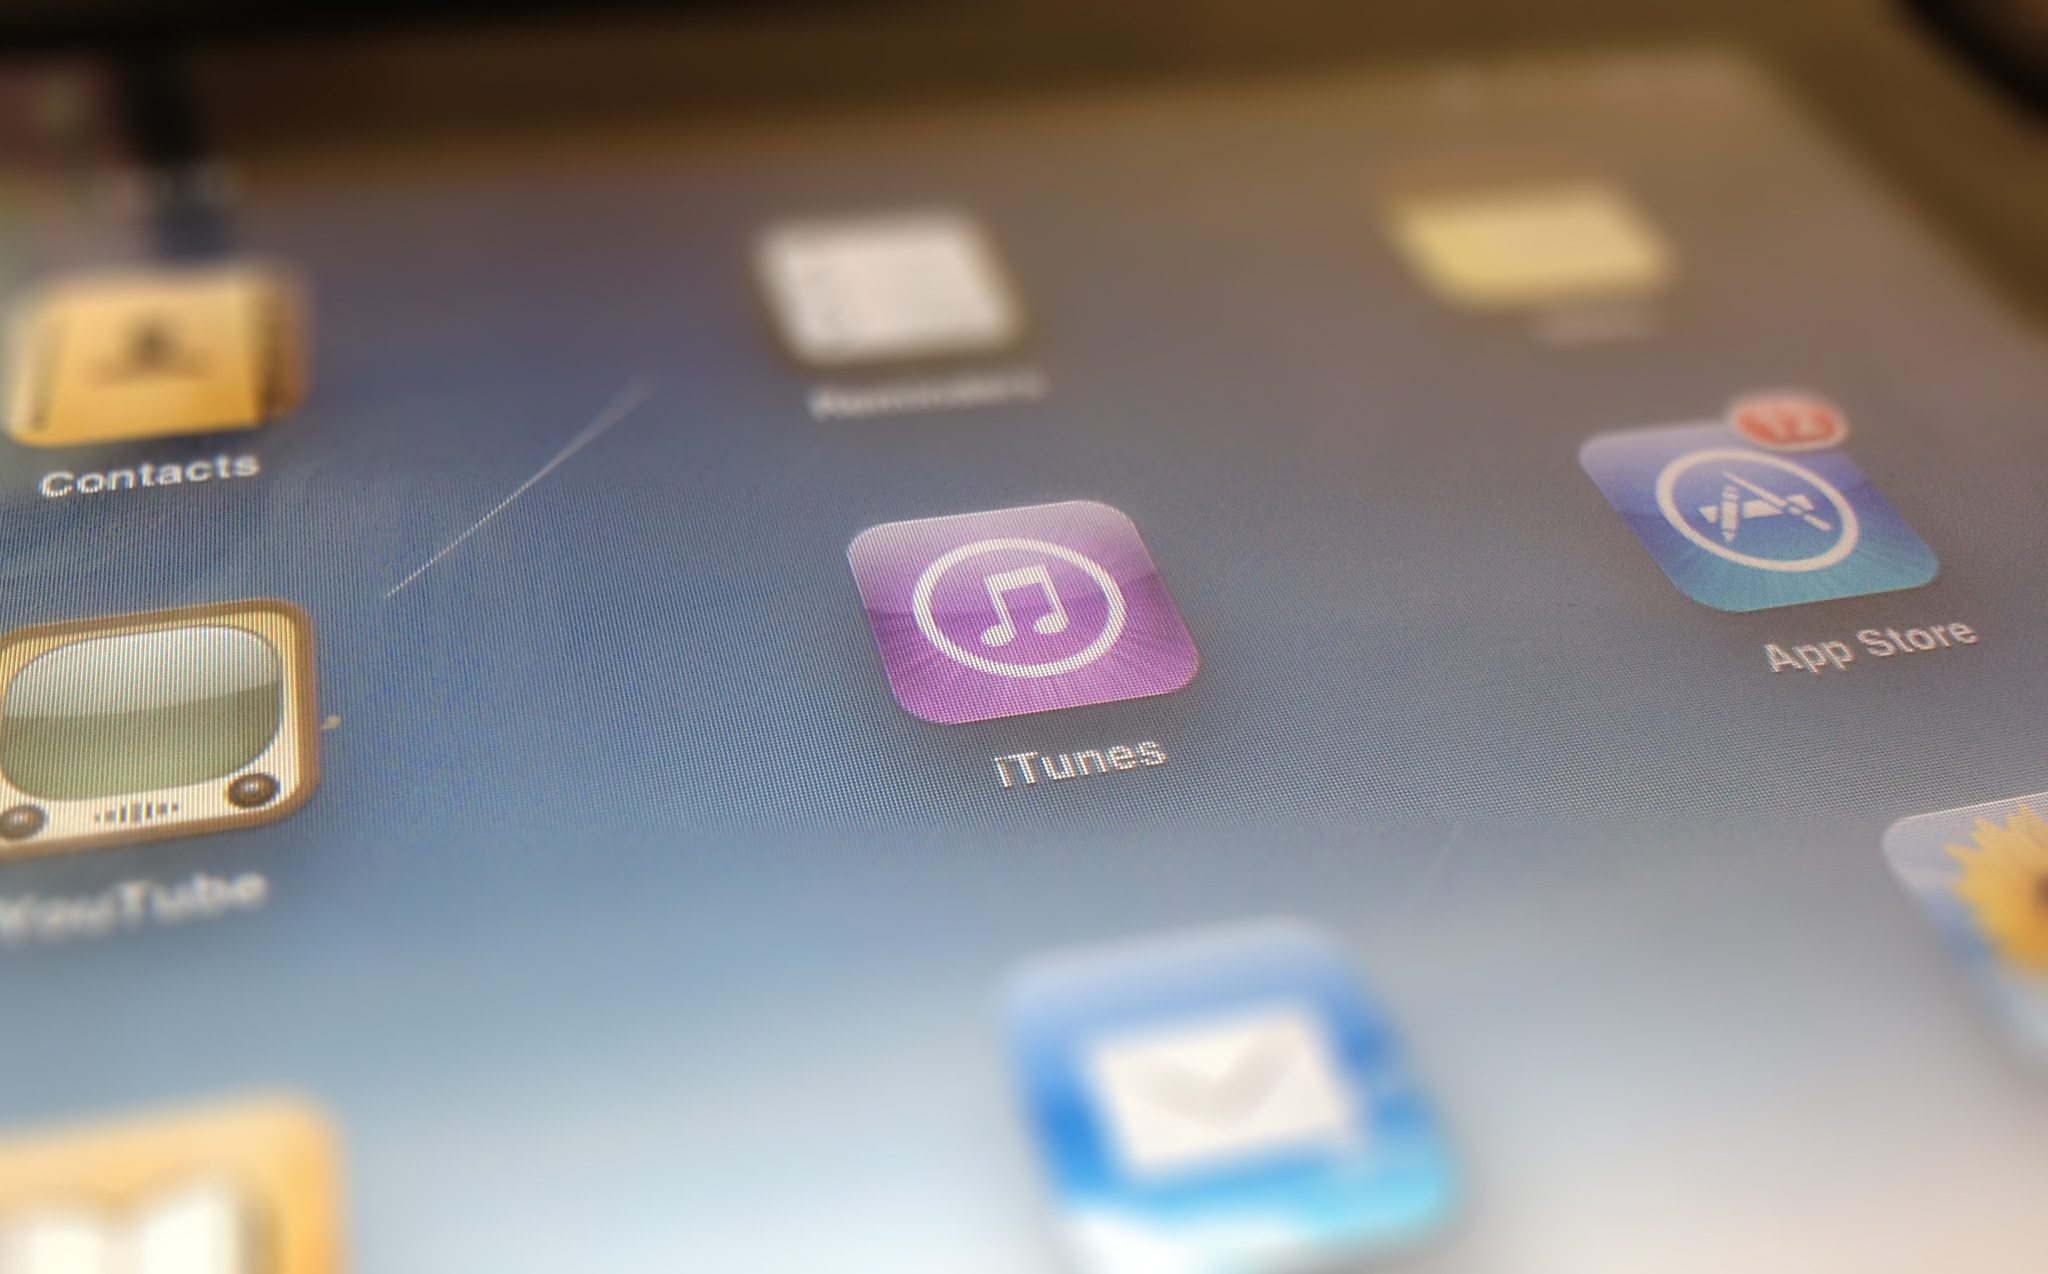 iTunes on iPad. Credit: The Sociable